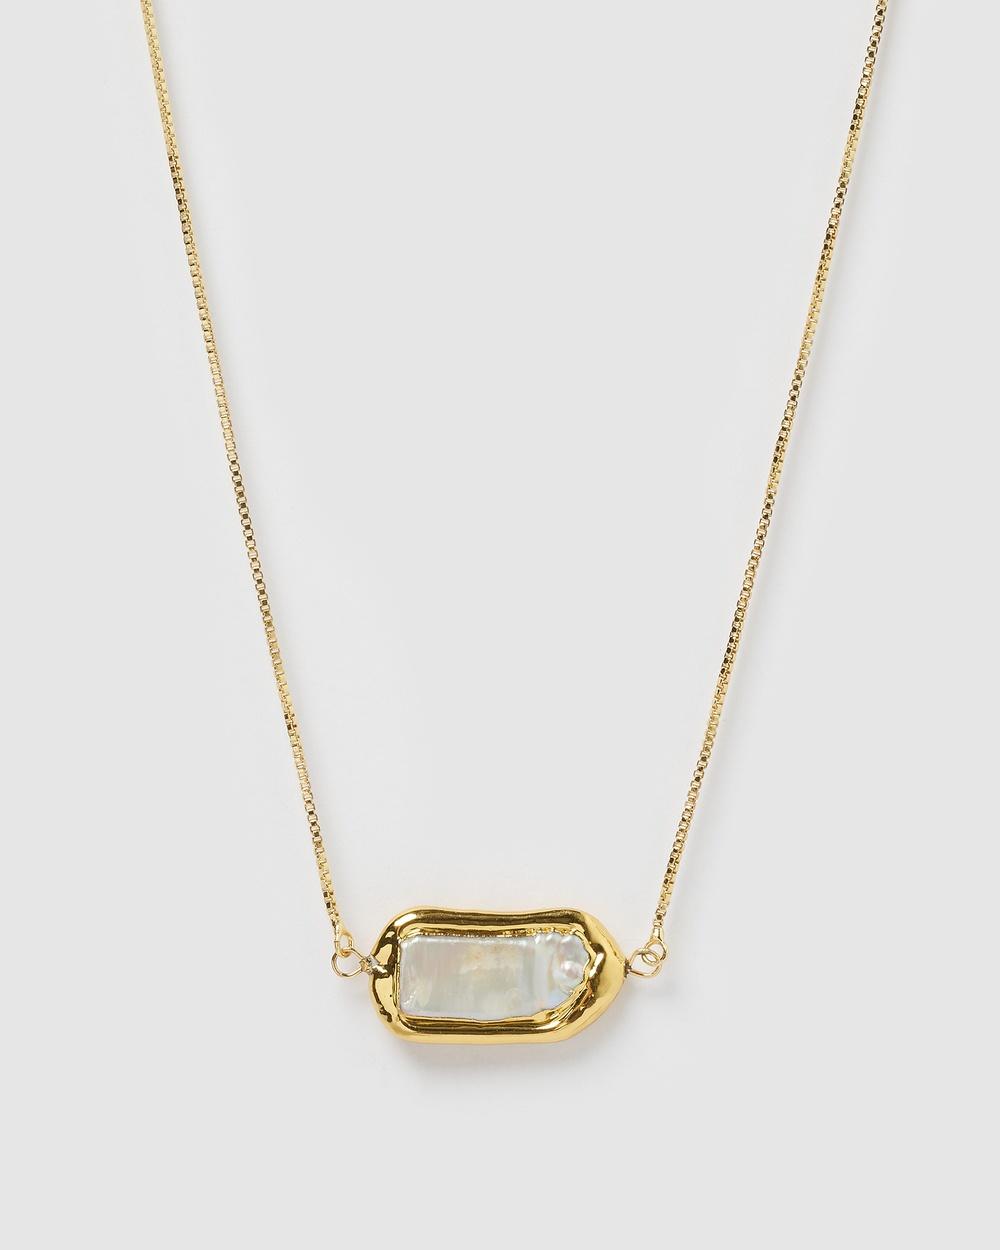 Miz Casa and Co Abigail Necklace Jewellery Gold